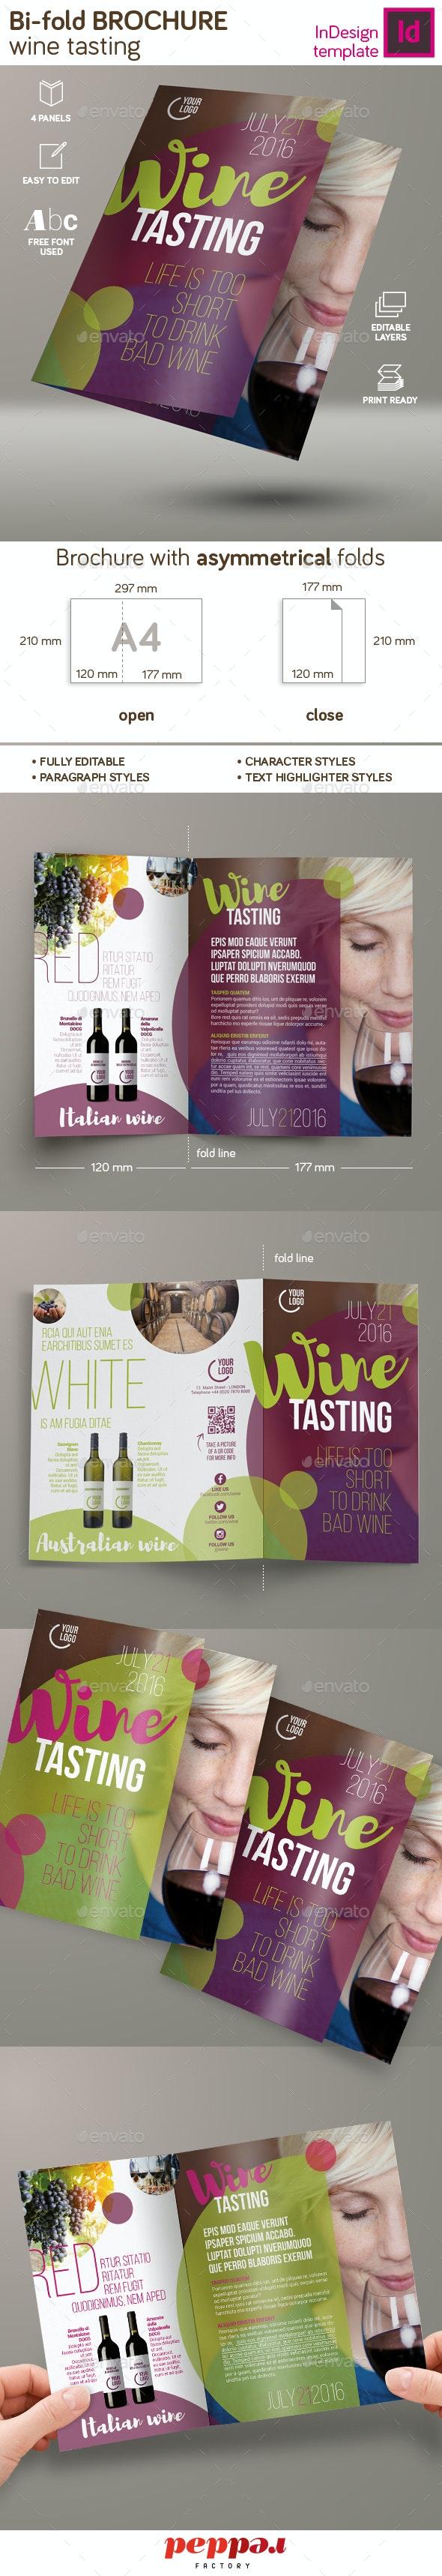 Wine Tasting Bi-Fold Brochure - Brochures Print Templates